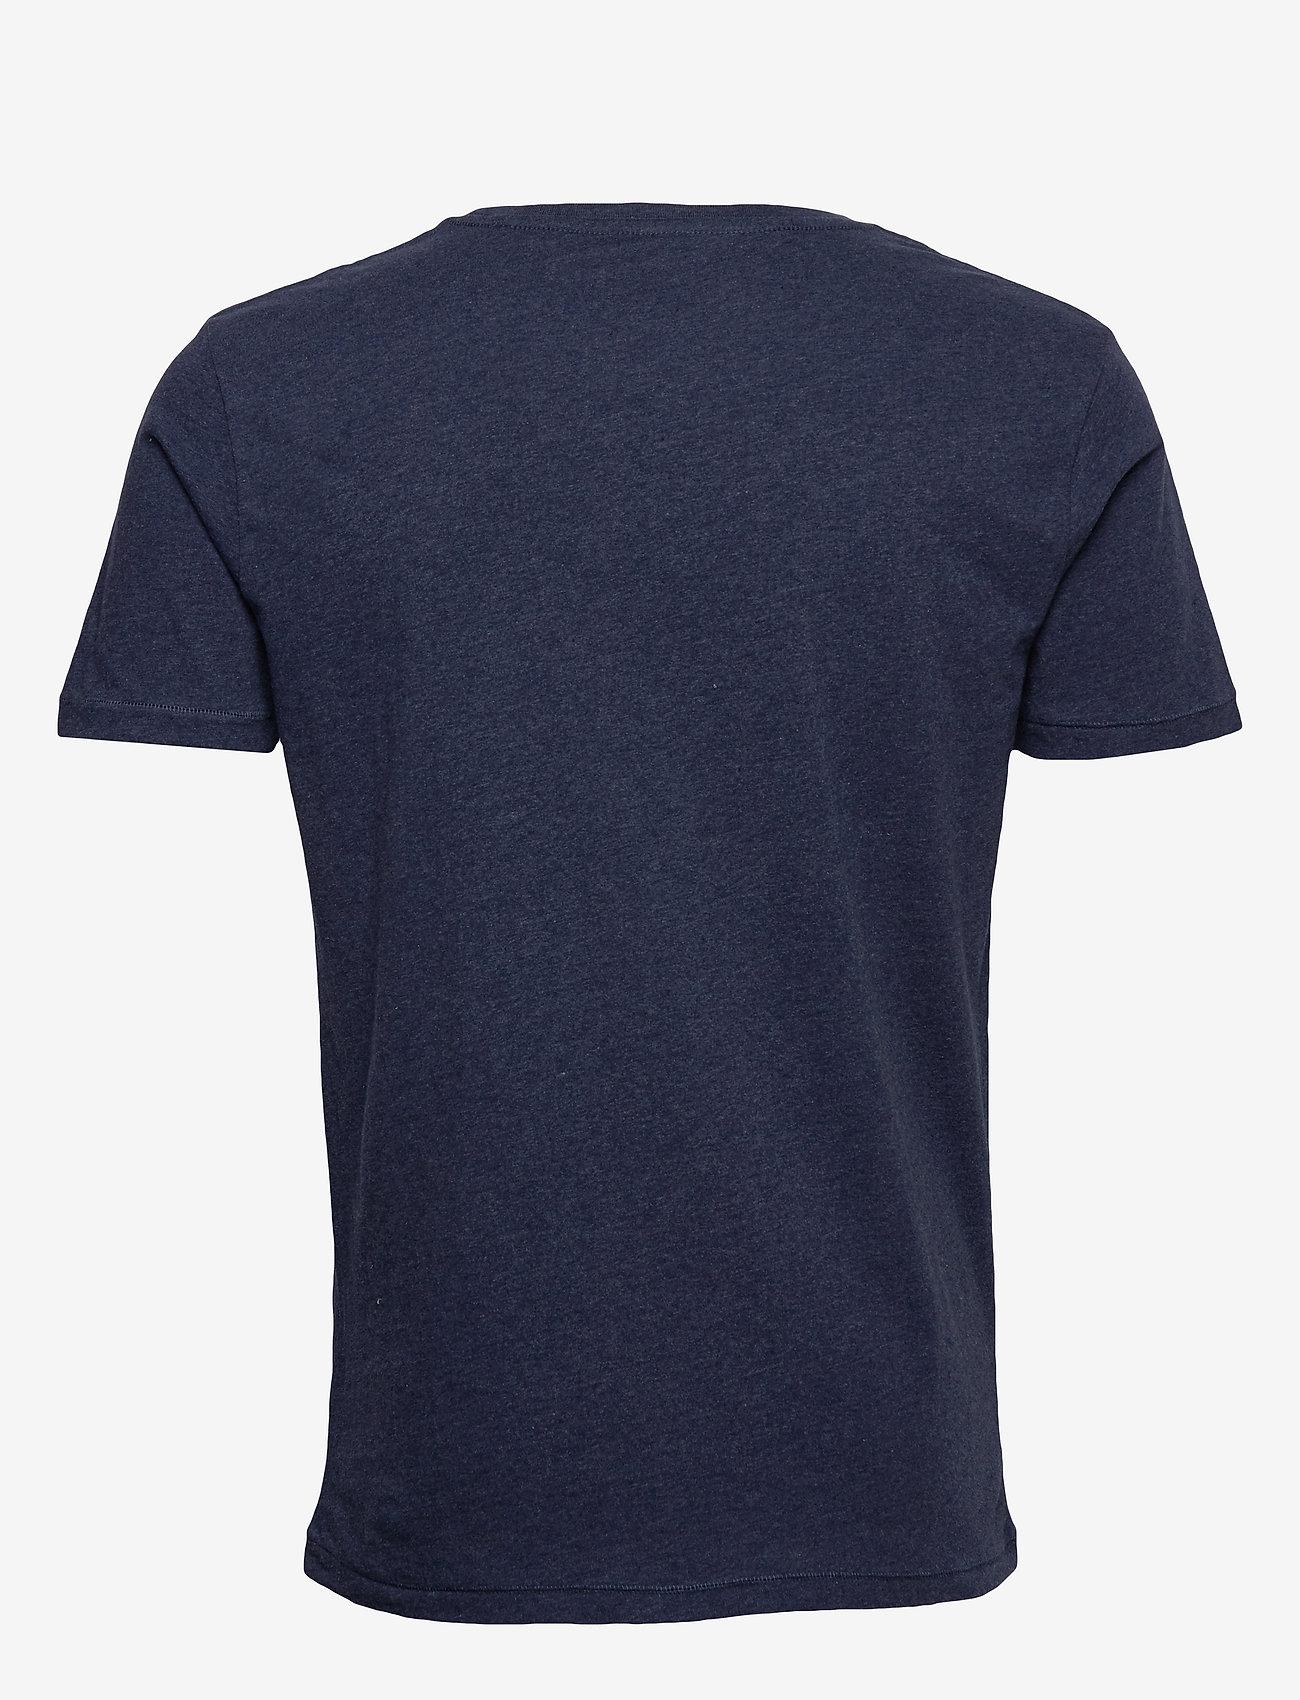 Knowledge Cotton Apparel - ALDER basic chest pocket tee - GOTS - basic t-krekli - insigna blue melange - 1